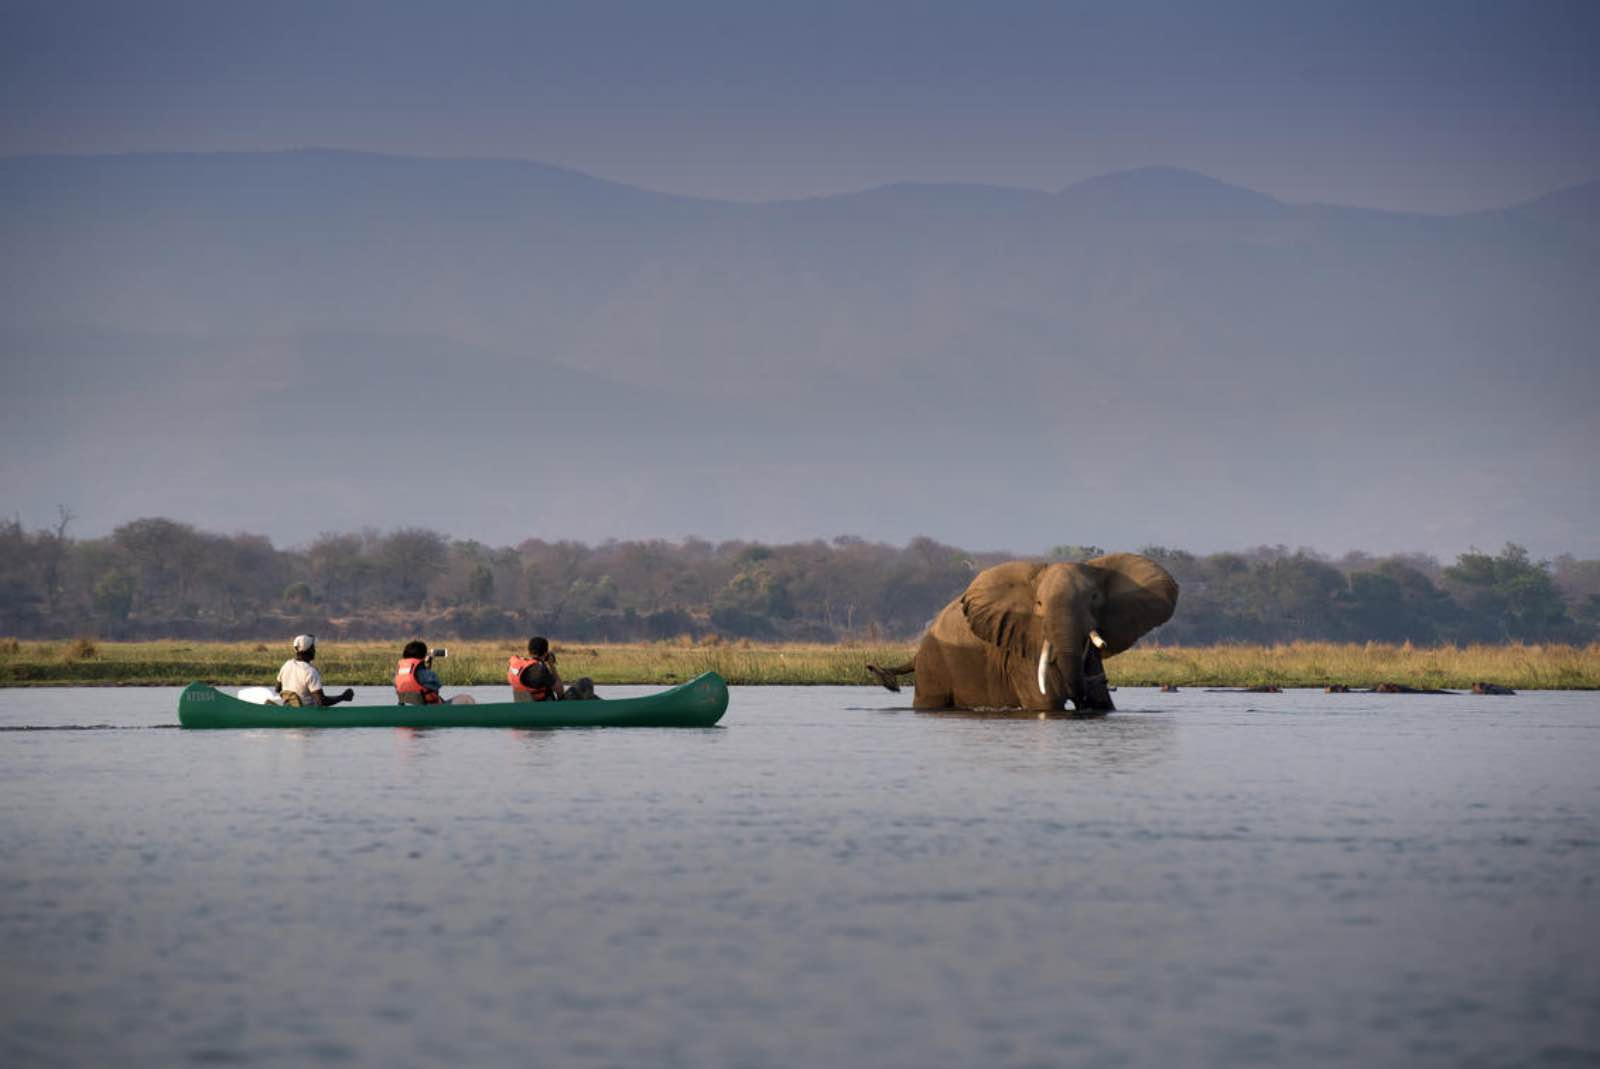 Nyamatusi elephants on a canoe